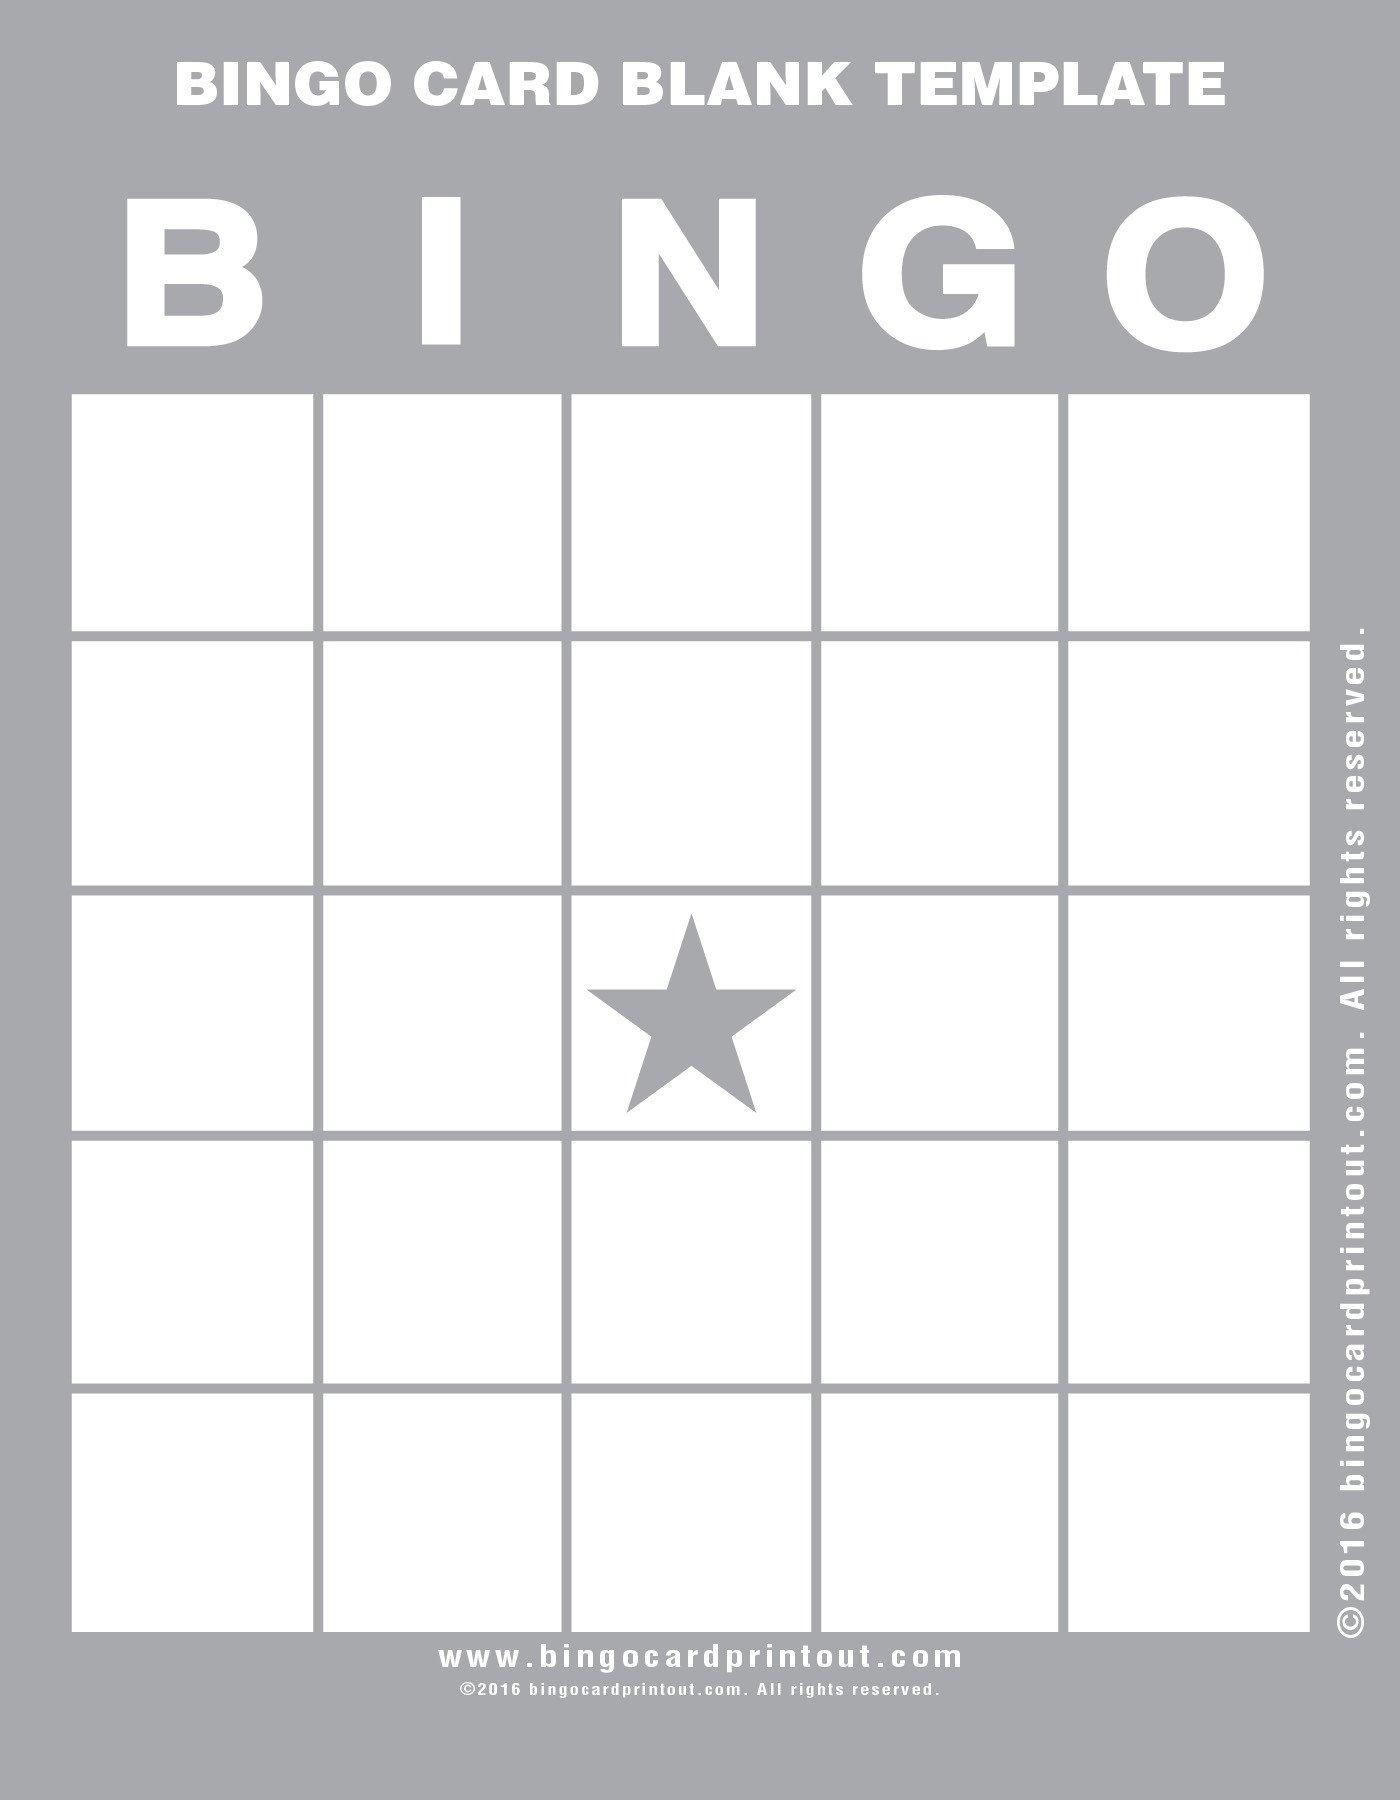 Free Bingo Card Template Bingo Card Blank Template Bingocardprintout